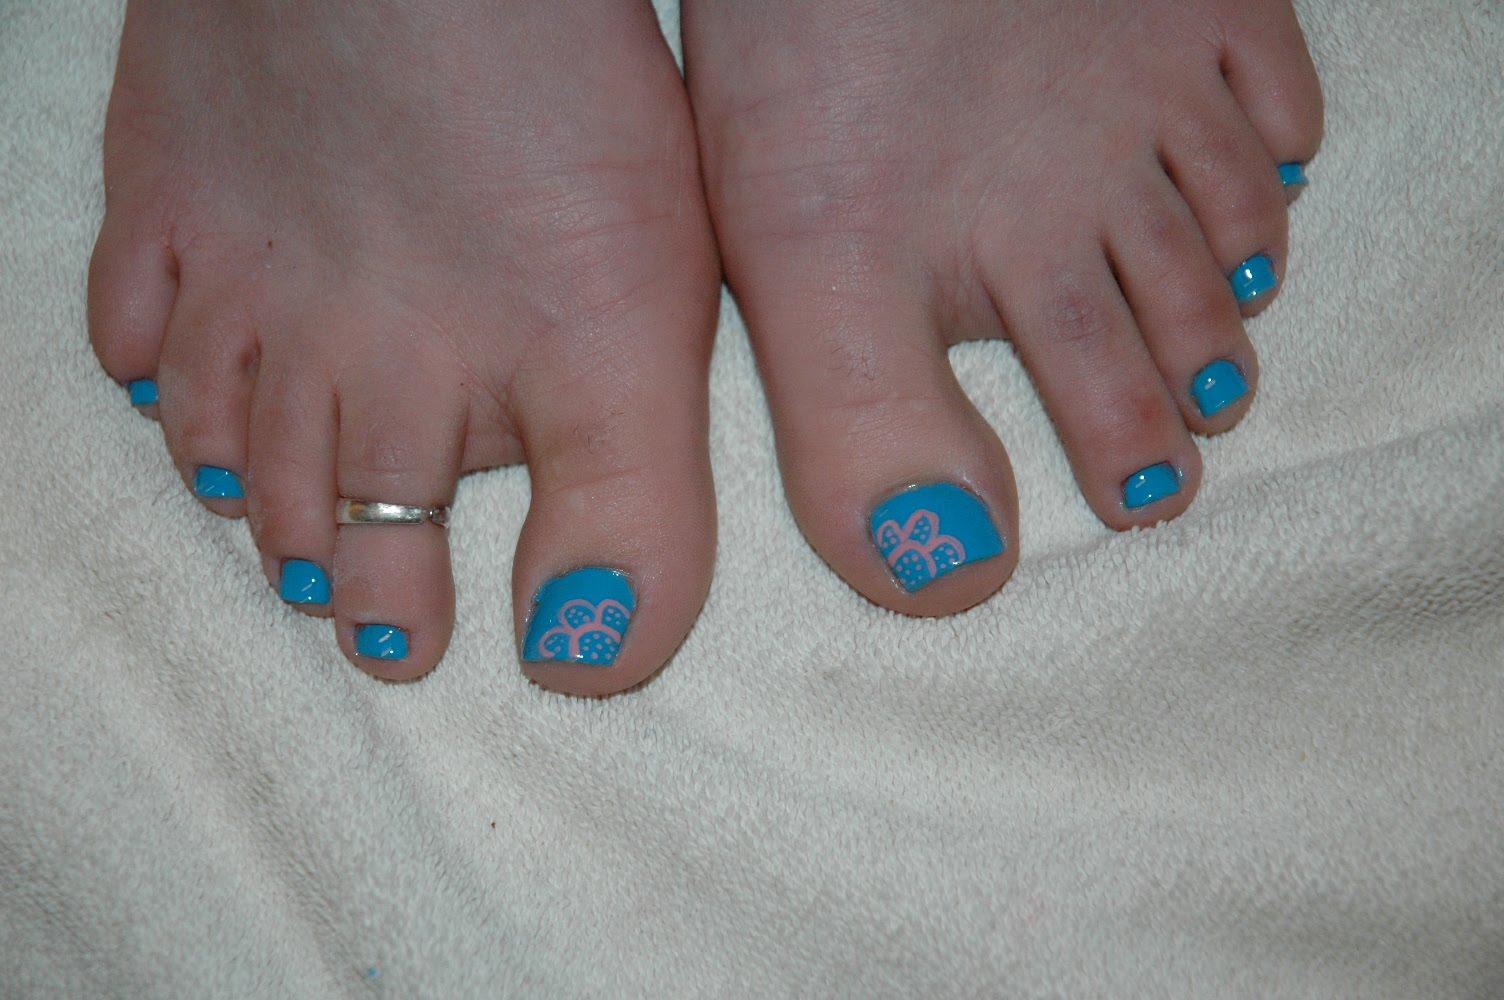 daqui. http://jktanner.blogspot.com.br/2010/04/more-toenail-painting